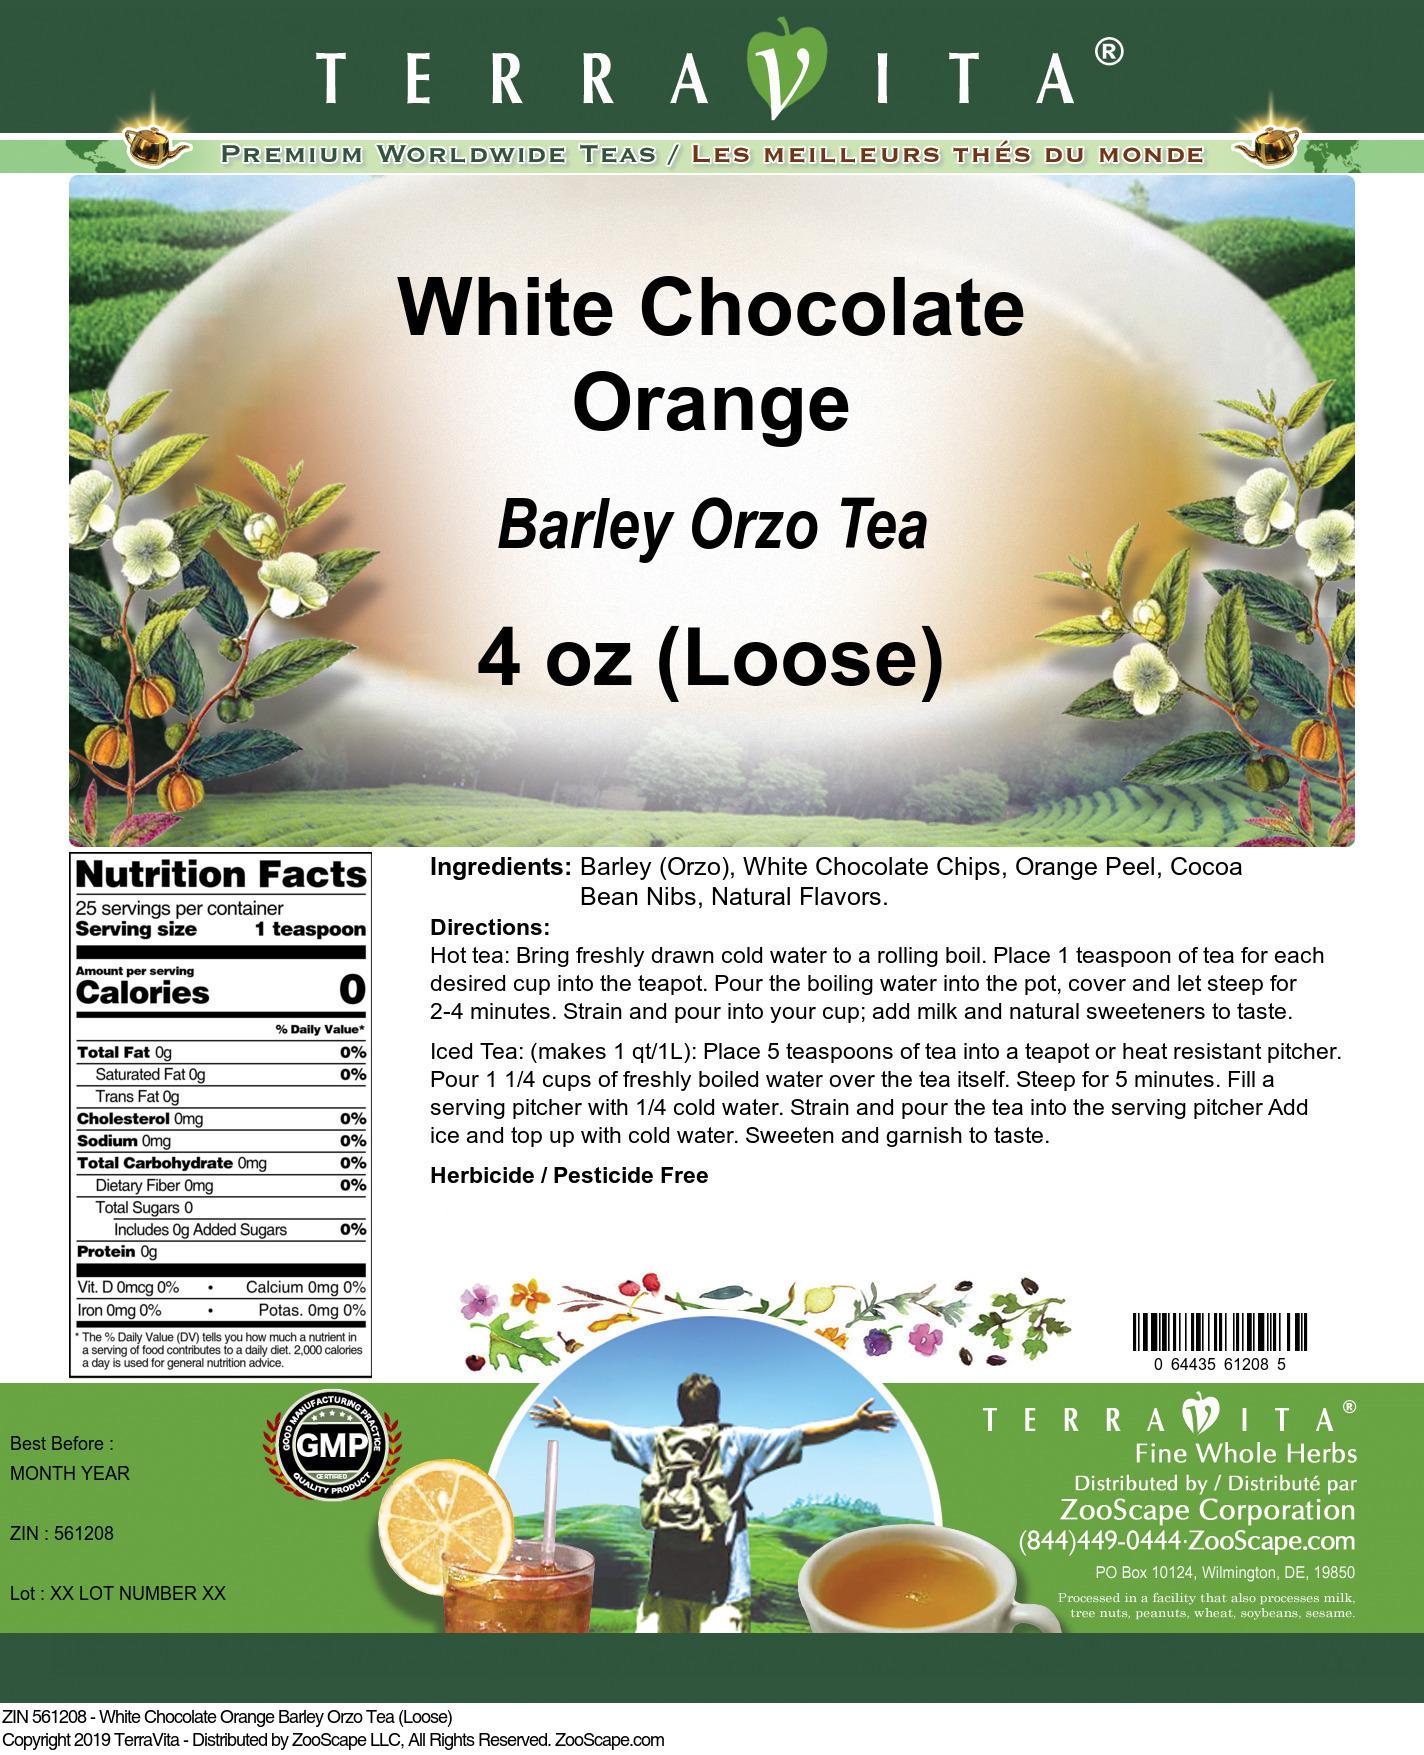 White Chocolate Orange Barley Orzo Tea (Loose)